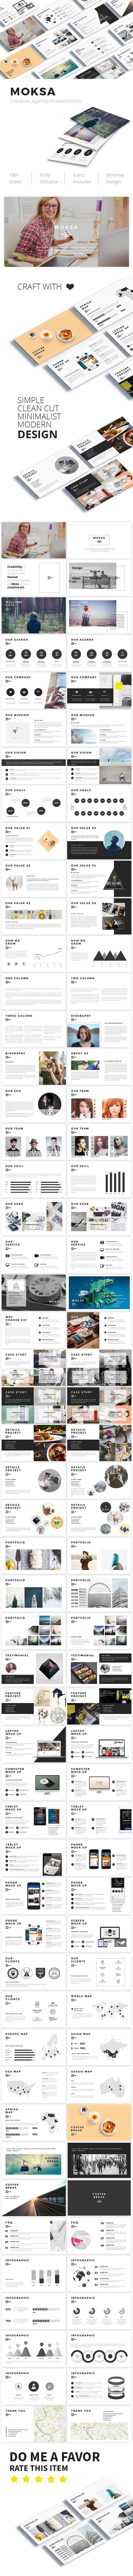 Moksa - Creative Agency Keynote Presentation - Creative PowerPoint Templates